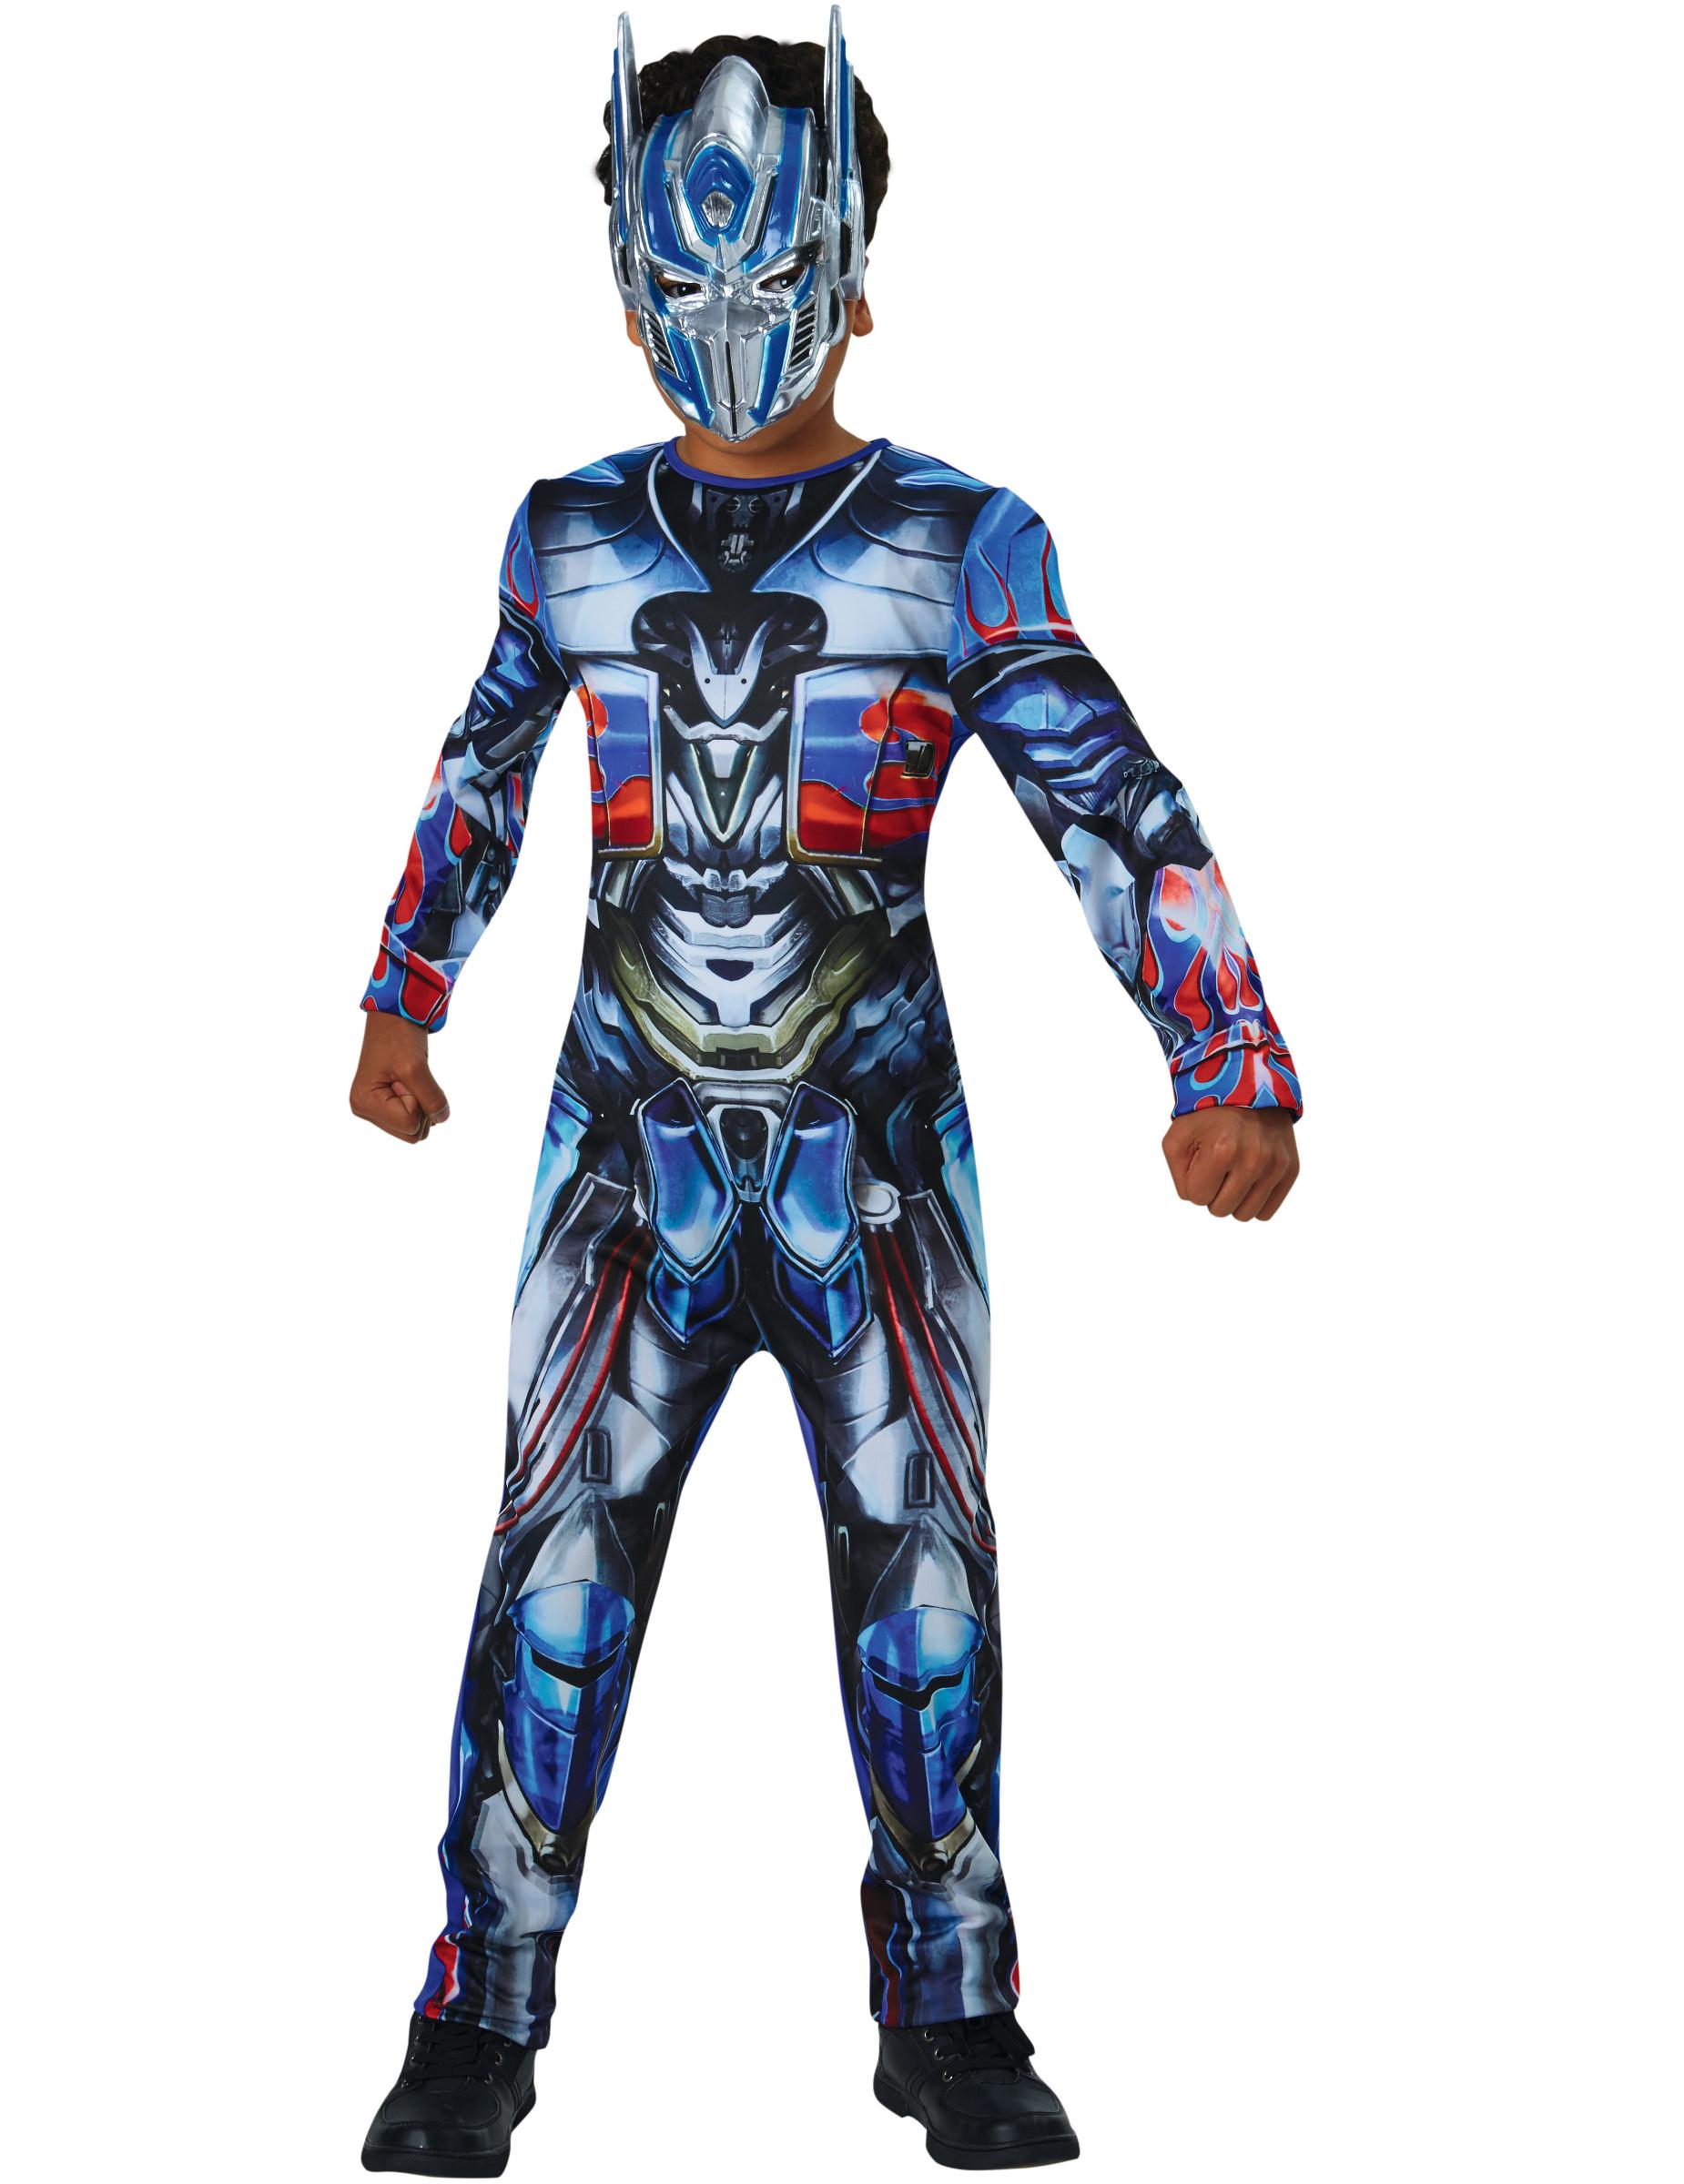 costume optimus prime transformers 5 bambino costumi. Black Bedroom Furniture Sets. Home Design Ideas